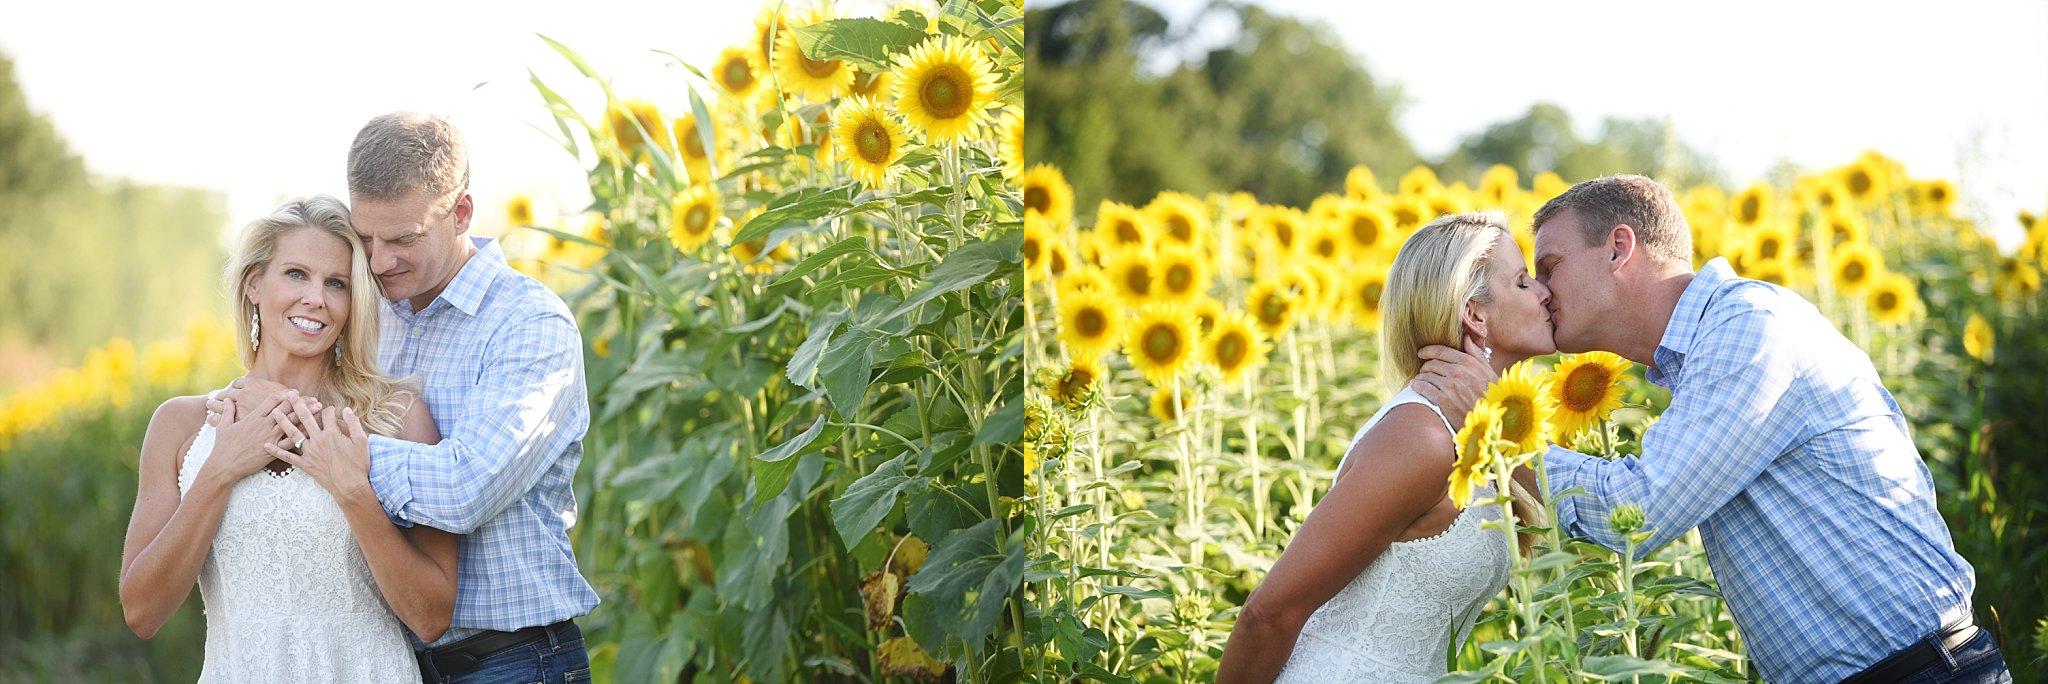 Sunflower-field-Photography-jenfolio_0135.jpg